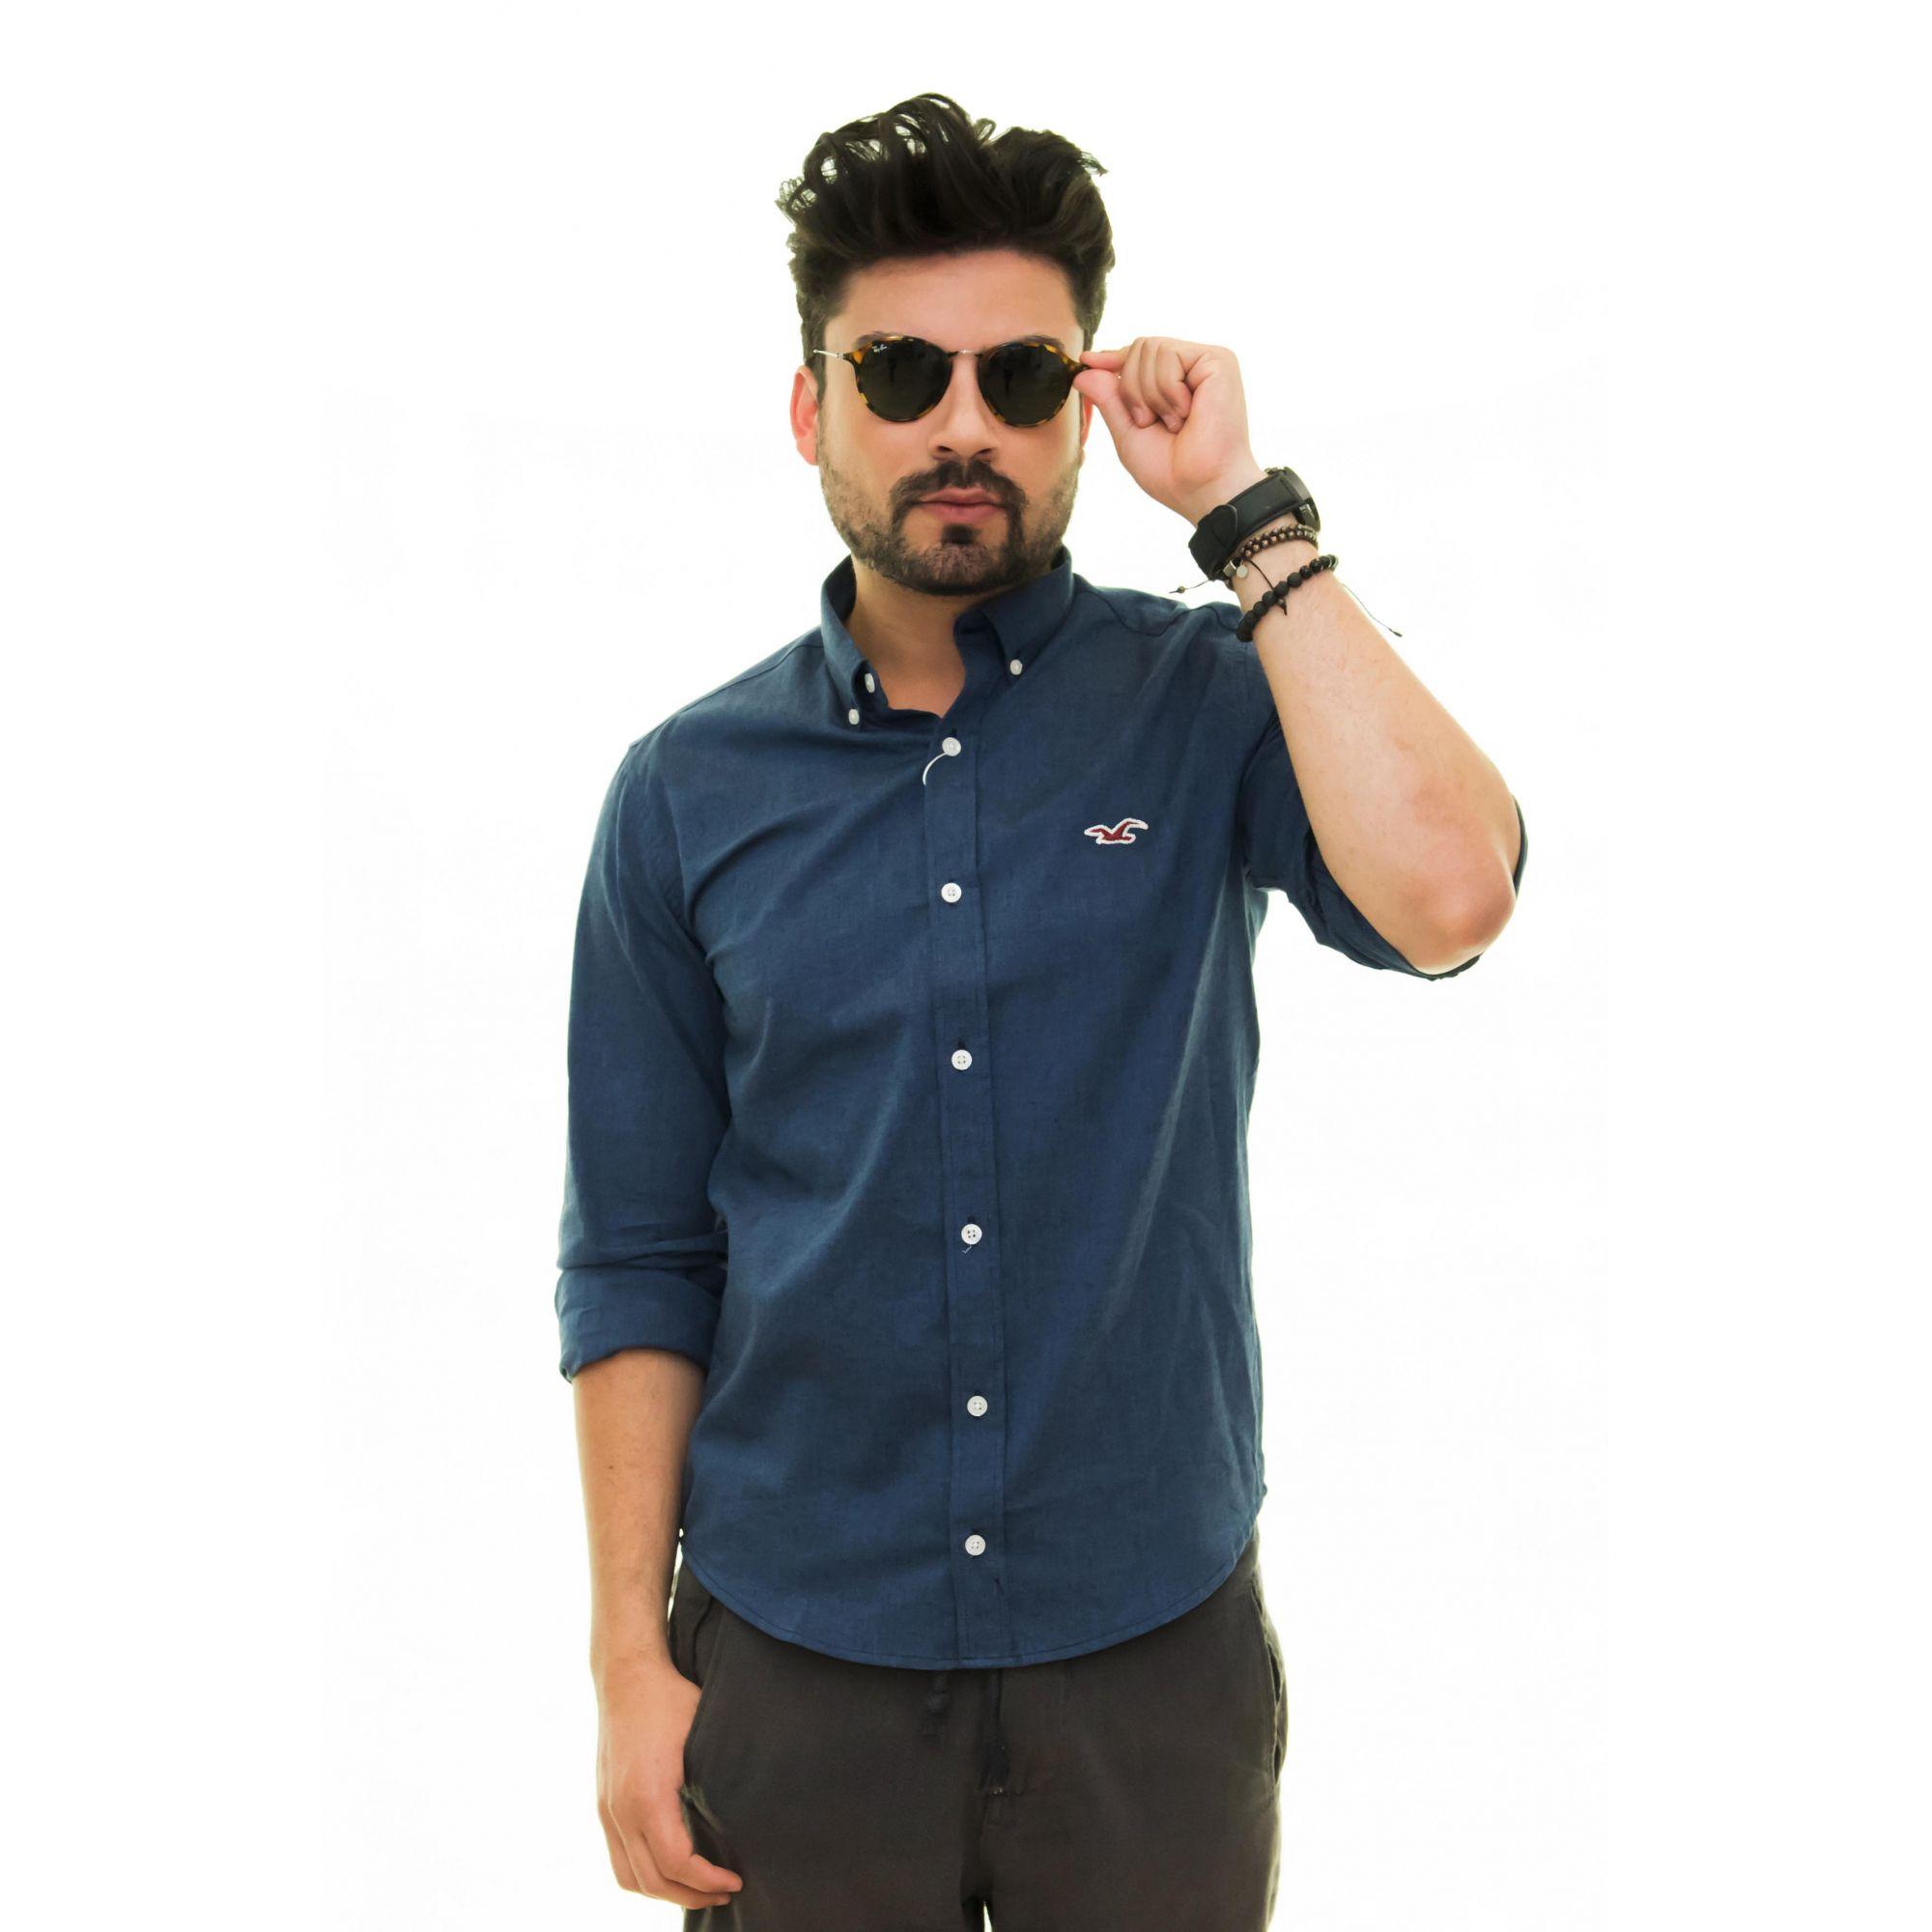 Camisa Social Hollister Oxford Marinho  - Ca Brasileira